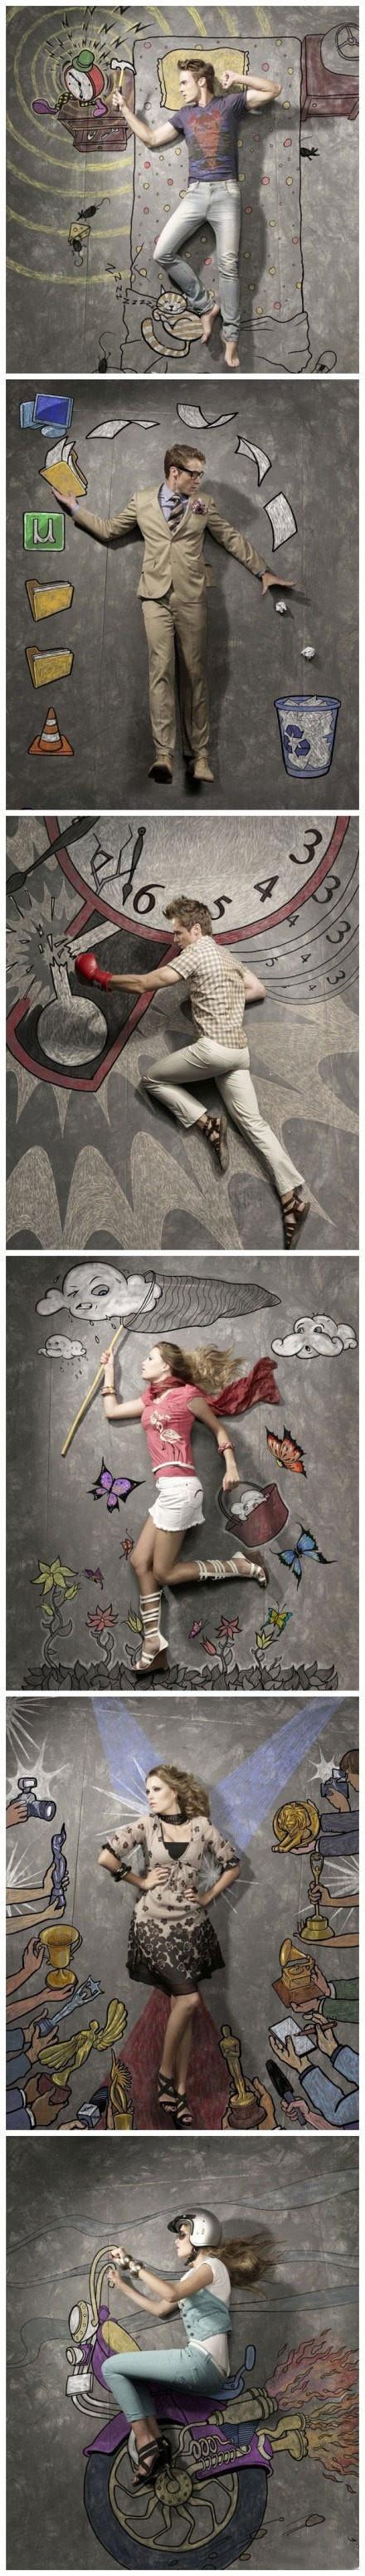 fantastische Illustrationen von Nithin Rao Kumblekar …